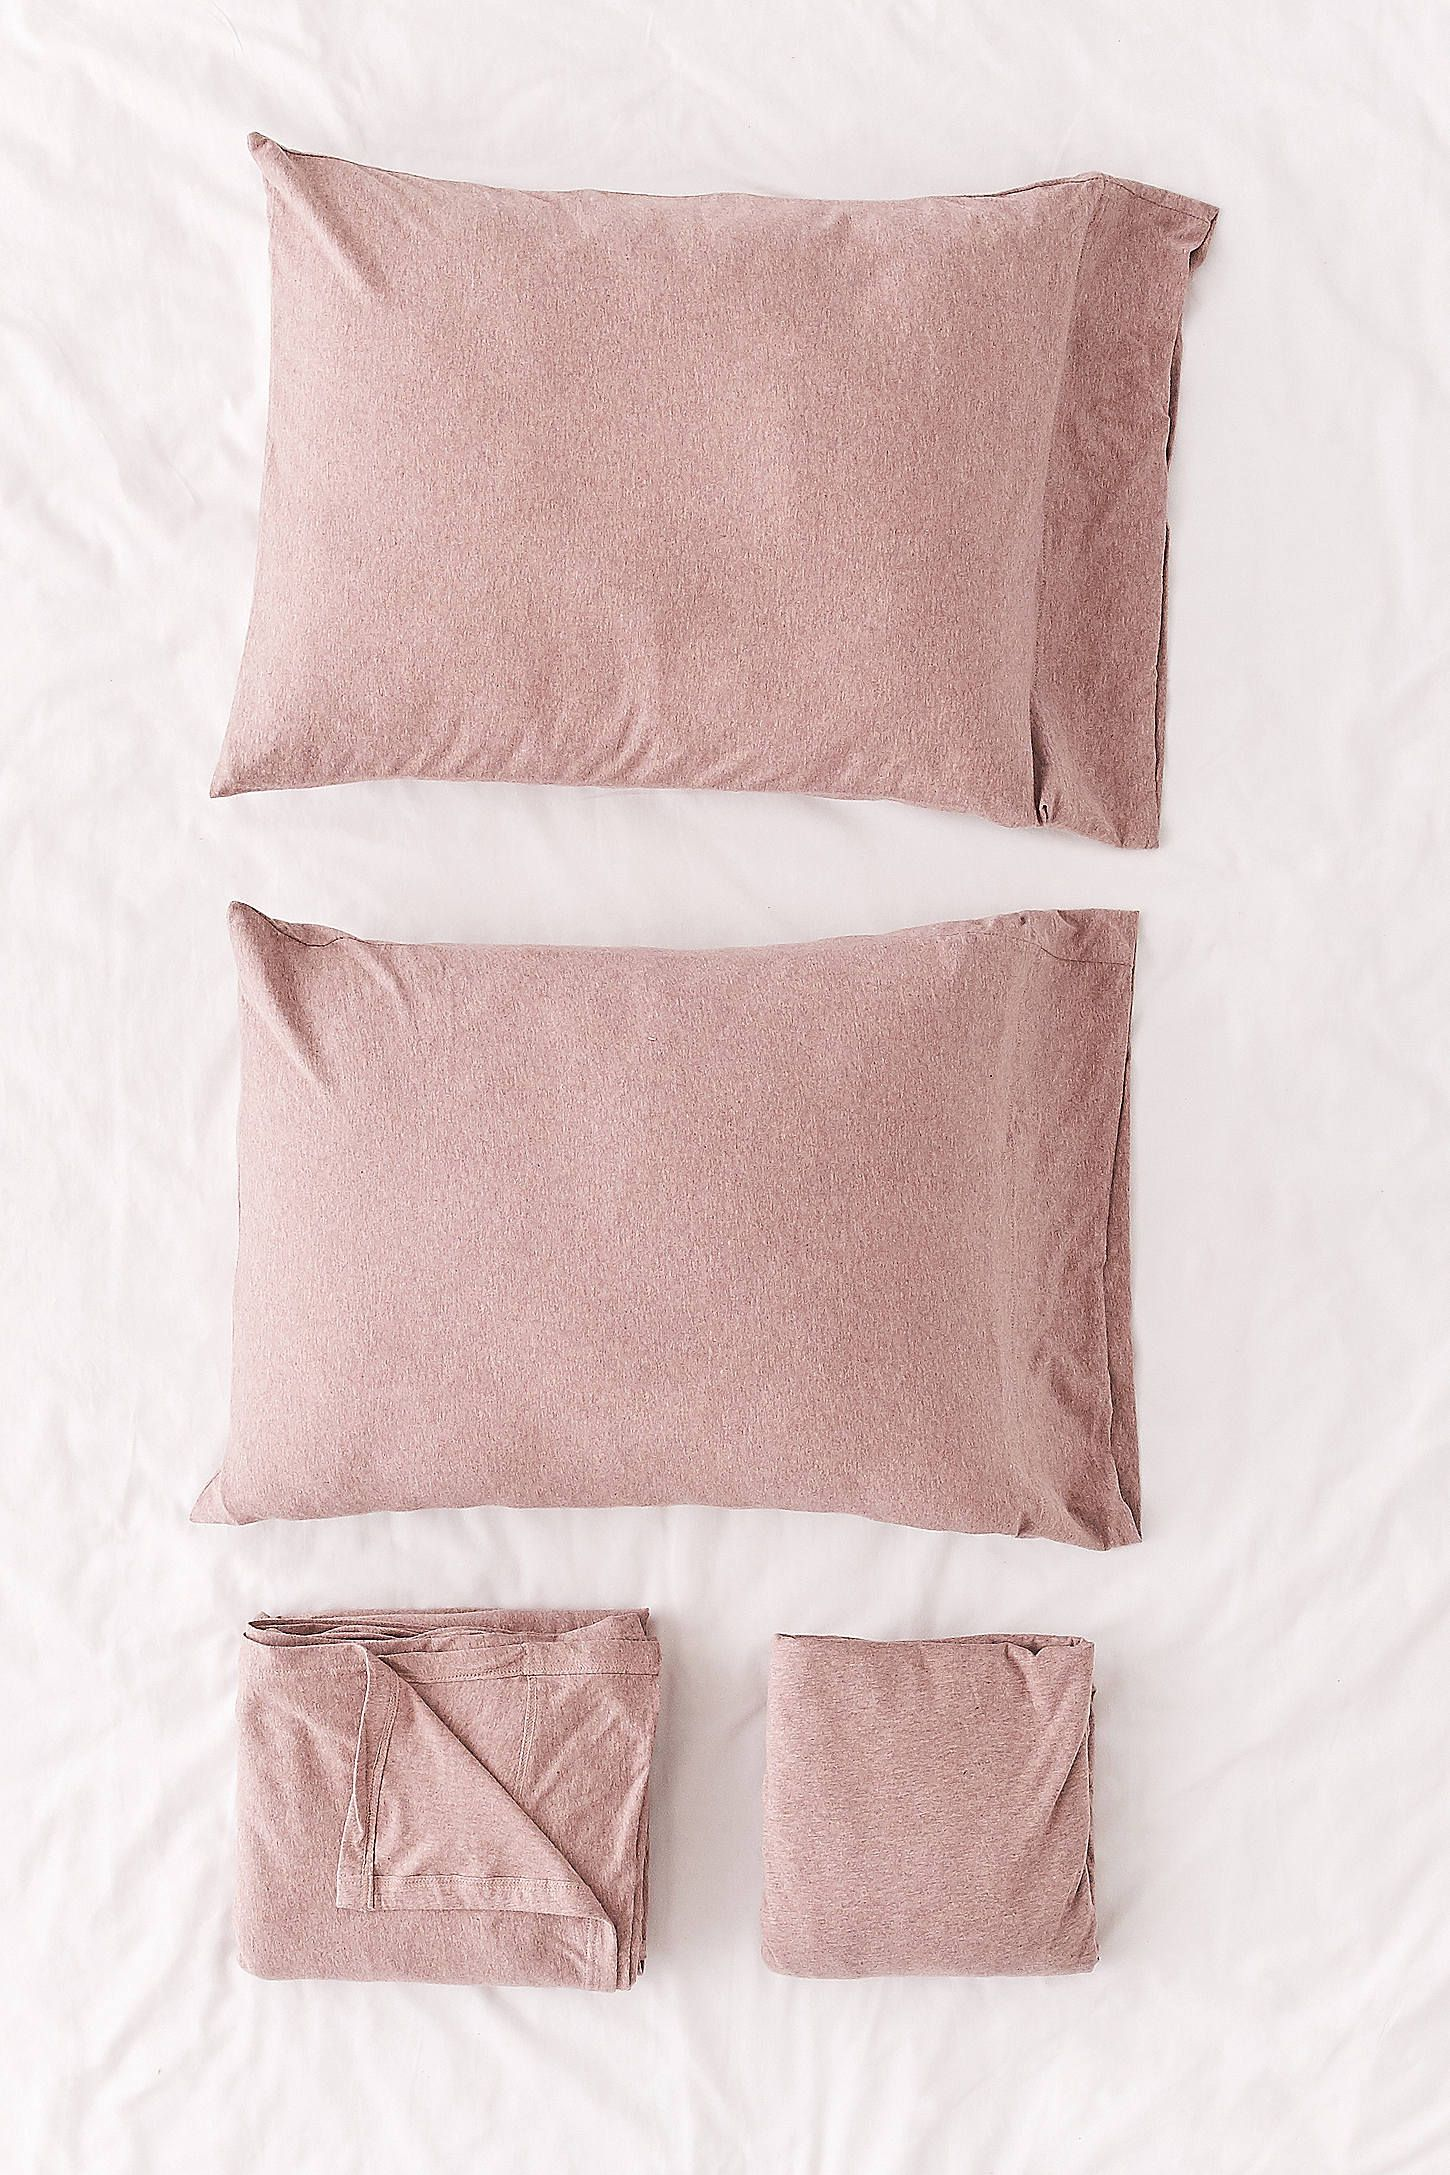 T Shirt Jersey Sheet Set Sheet Sets Boho Sheet Sets